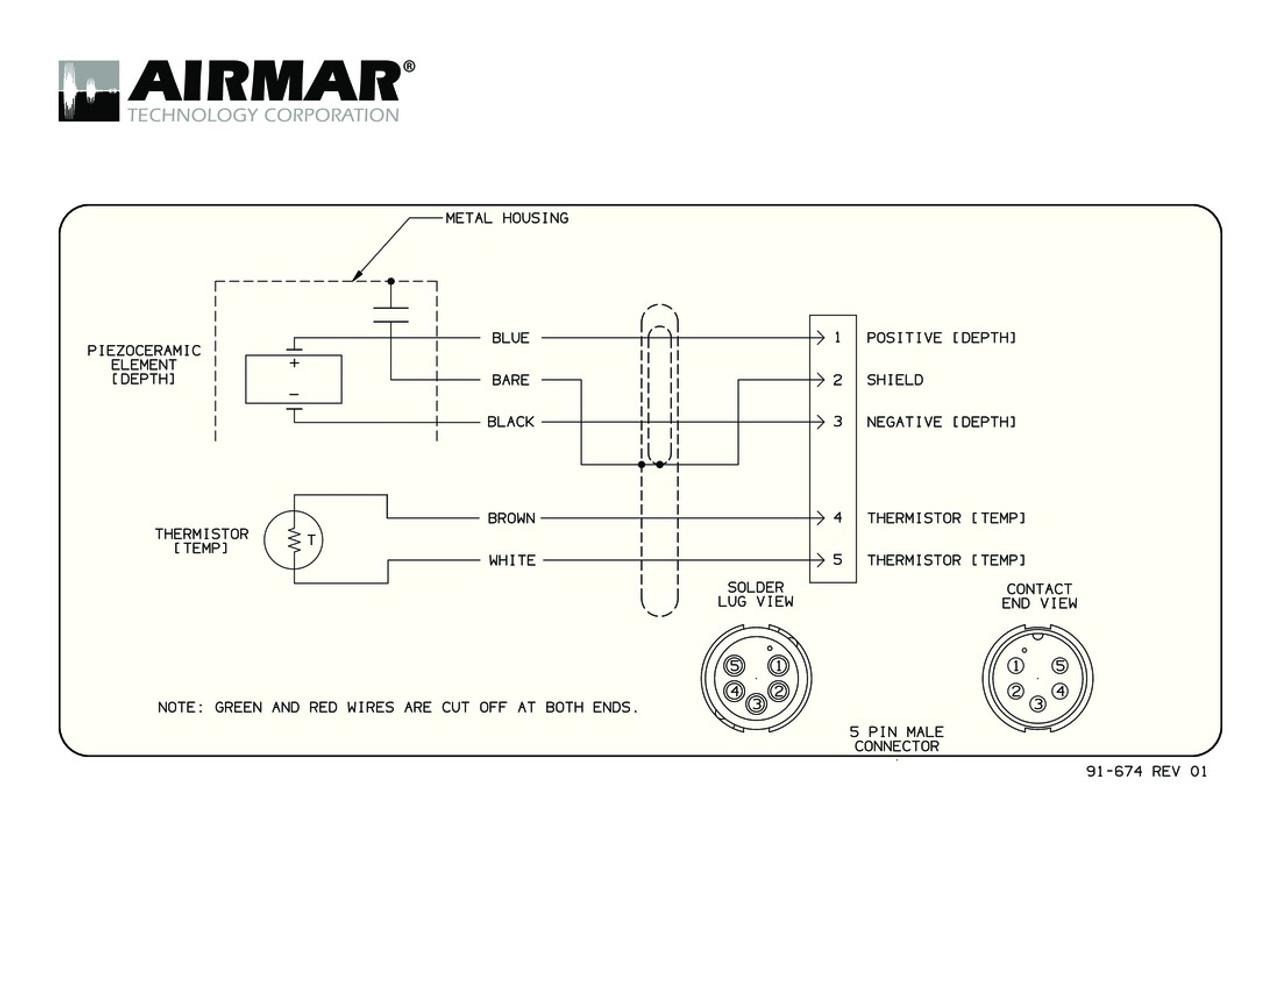 medium resolution of airmar wiring diagram mix and match 600w blue bottle marine airmar wiring diagrams